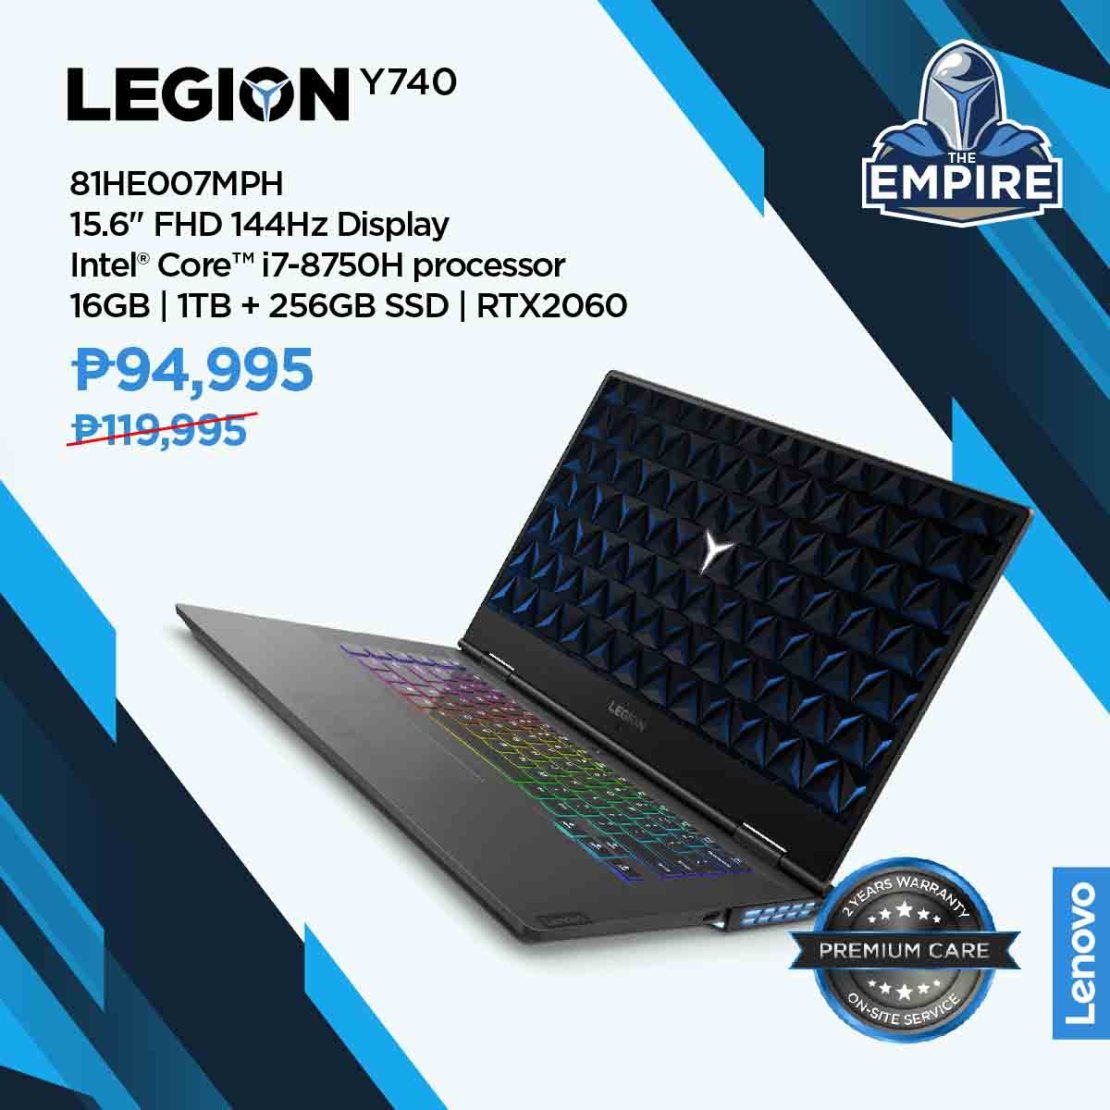 Lenovo, Legion, gamers, The Empire, League of Champions